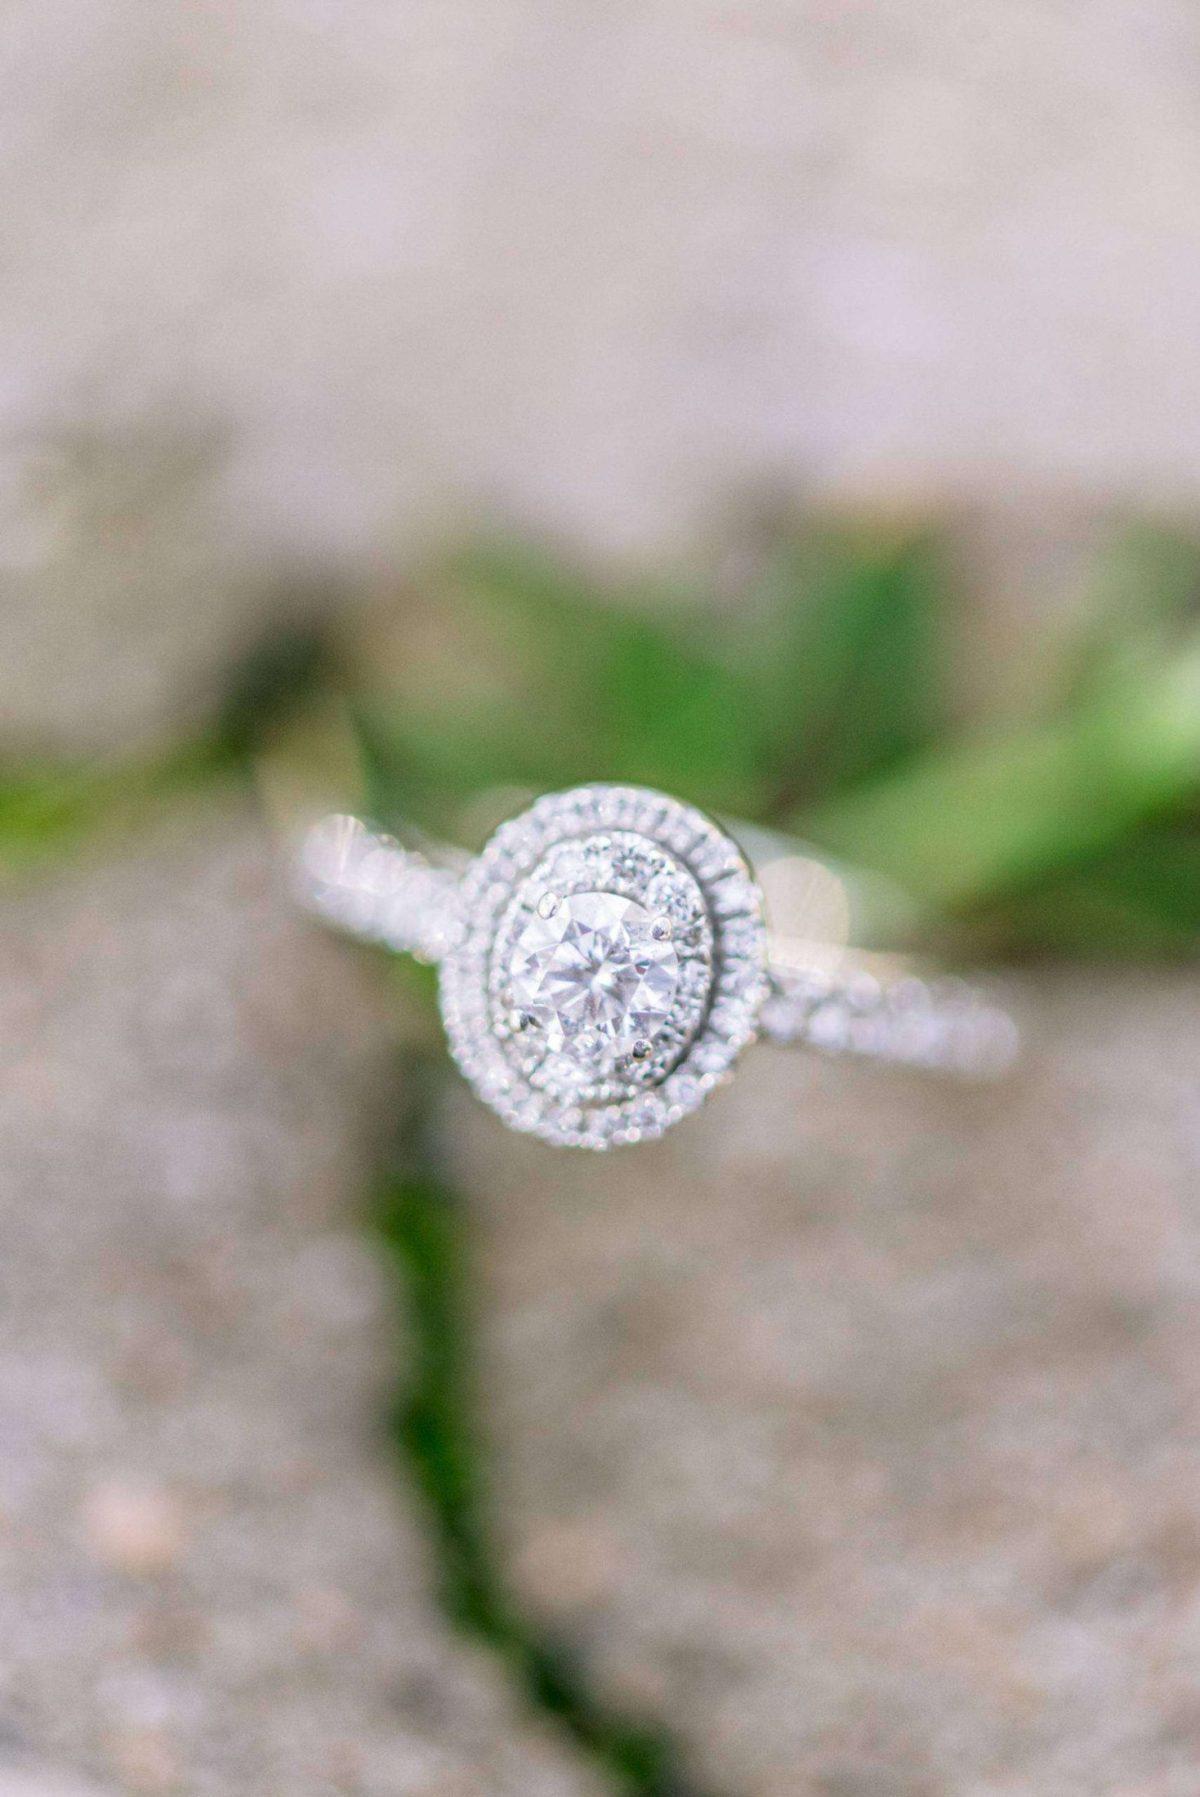 princess cut diamond engagement ring at laguna gloria in austin texas